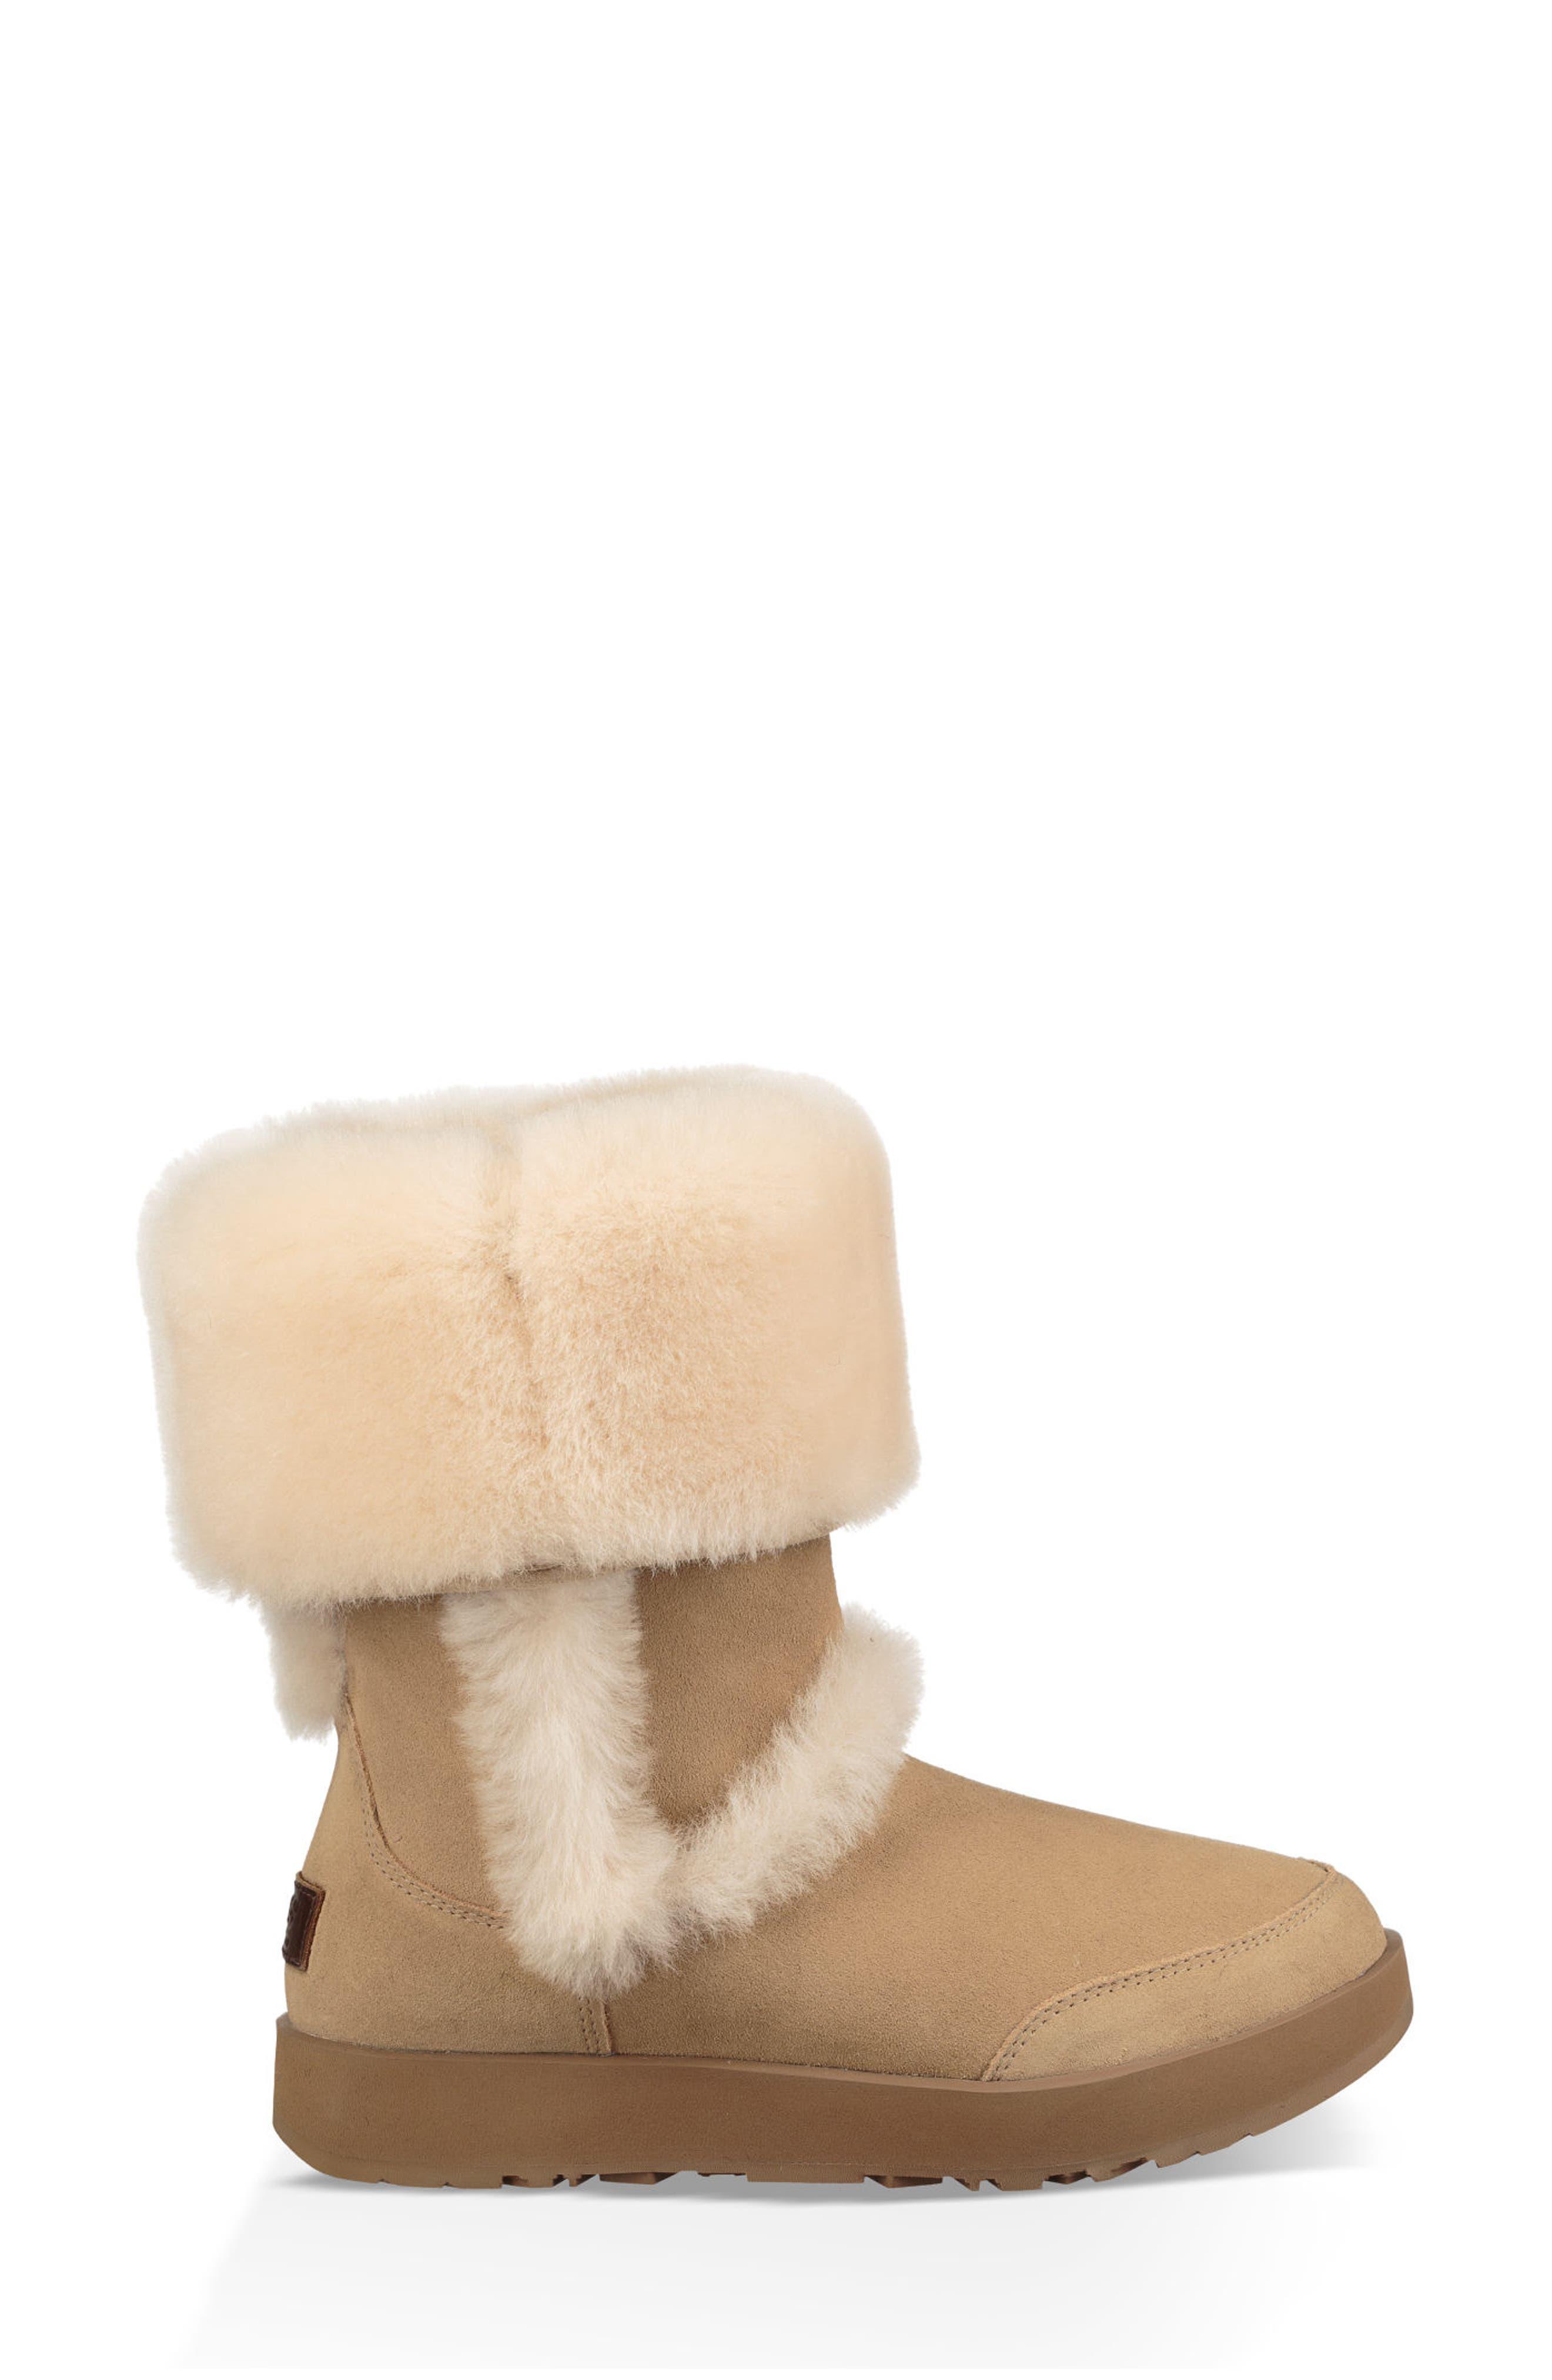 Sundance Genuine Shearling Waterproof Boot,                             Alternate thumbnail 5, color,                             Sand Suede